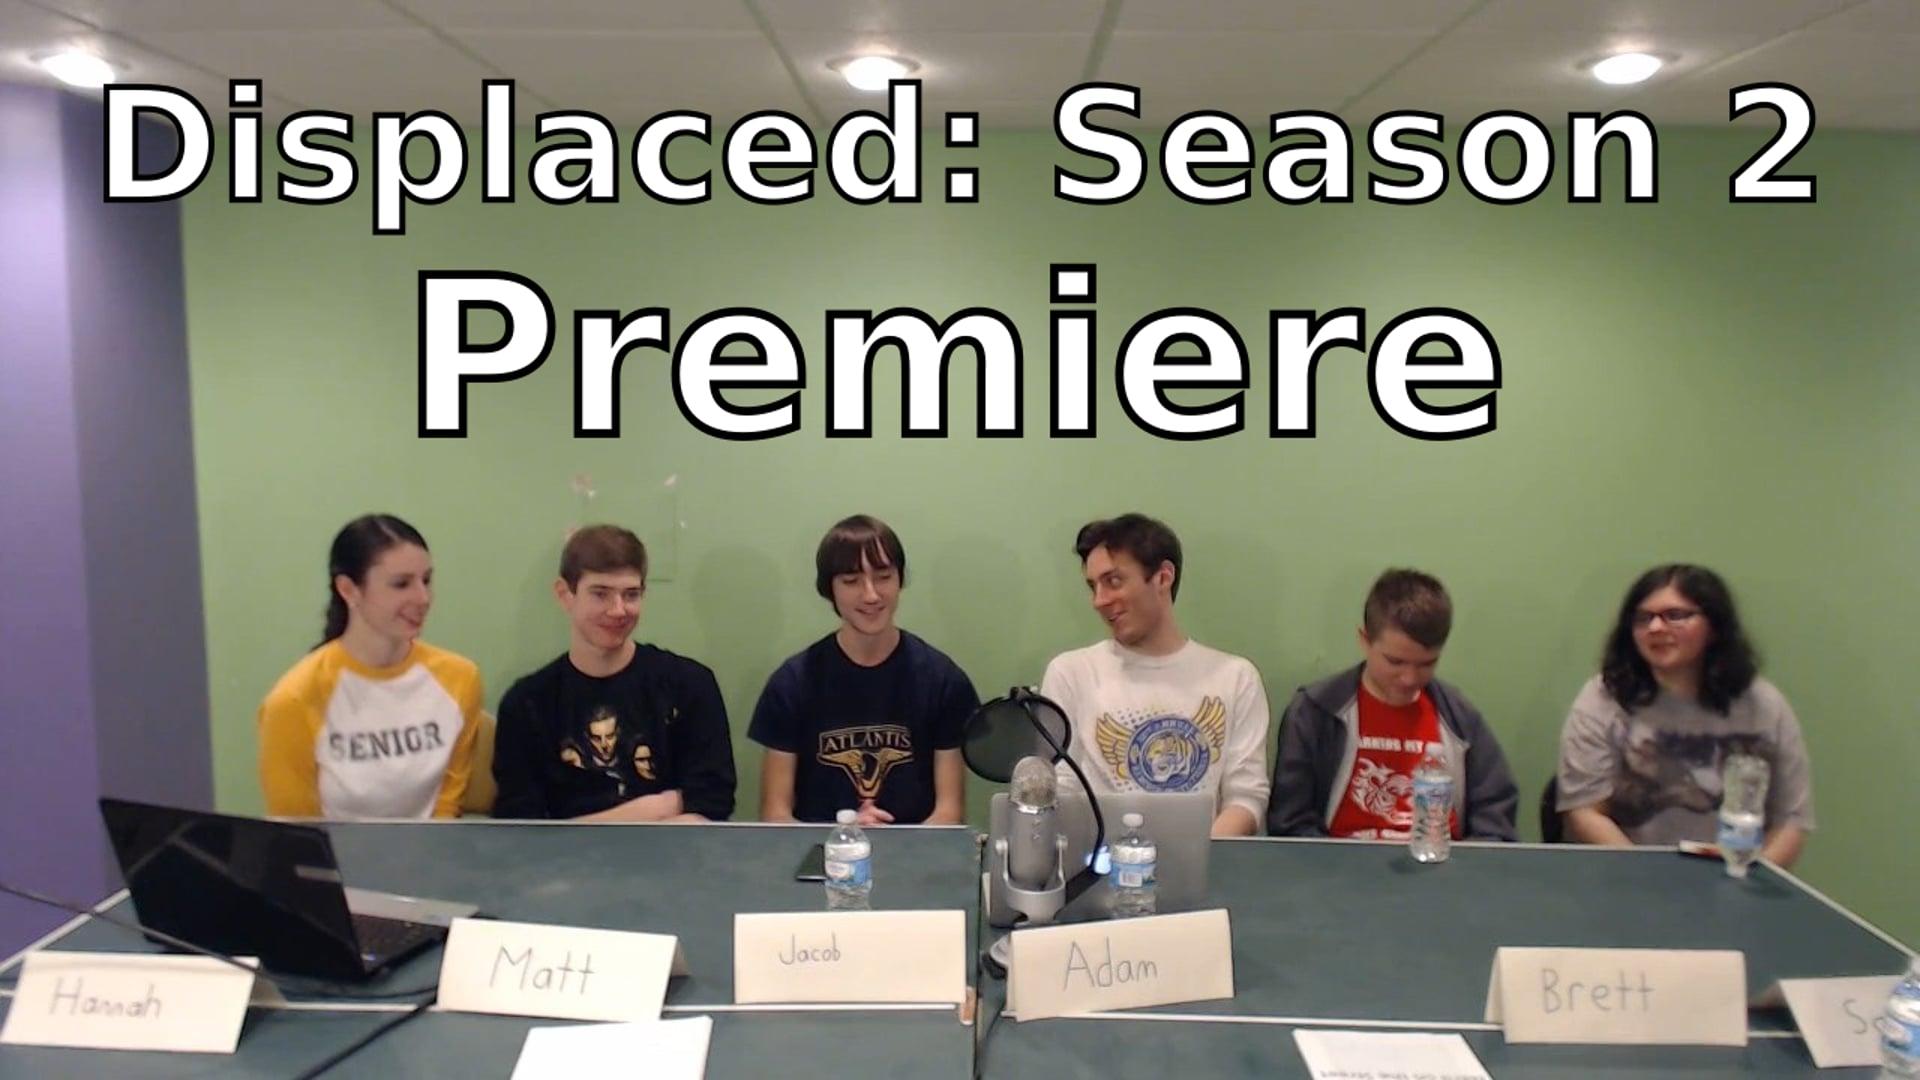 Displaced: Season 2 - Premiere Livestream